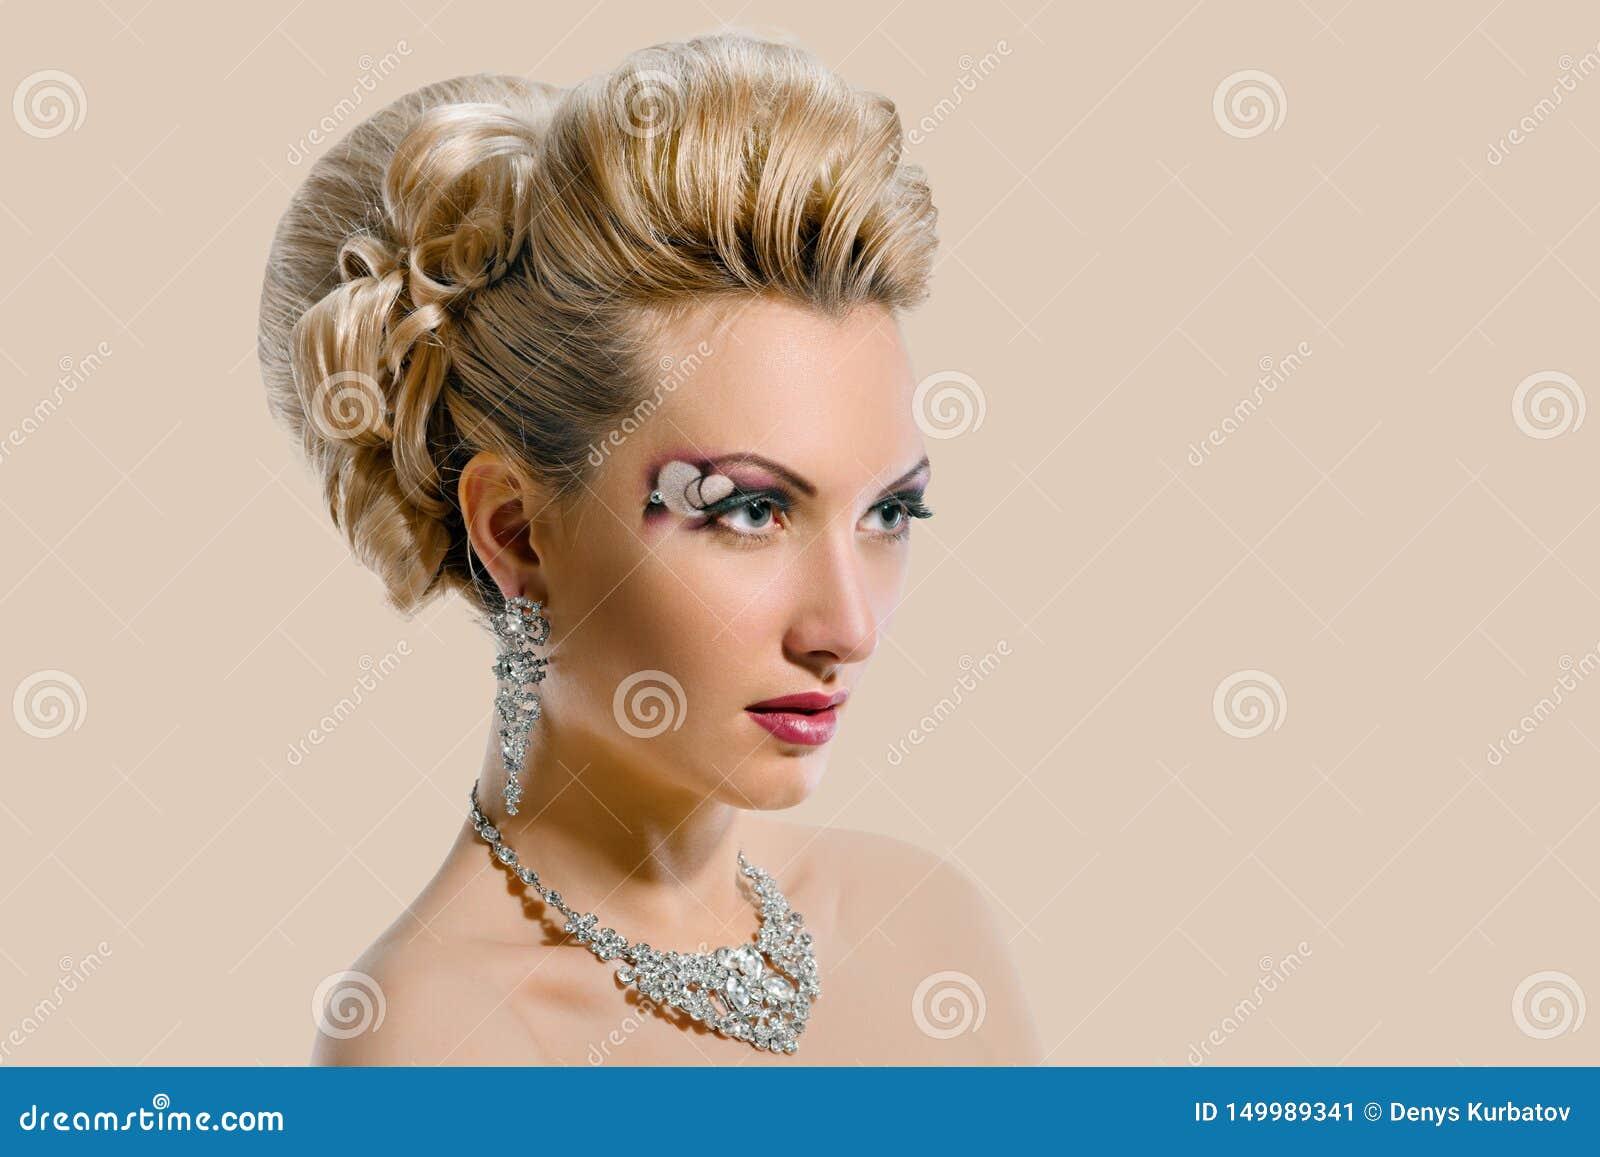 Невеста с творческими макияжем и стилем причесок